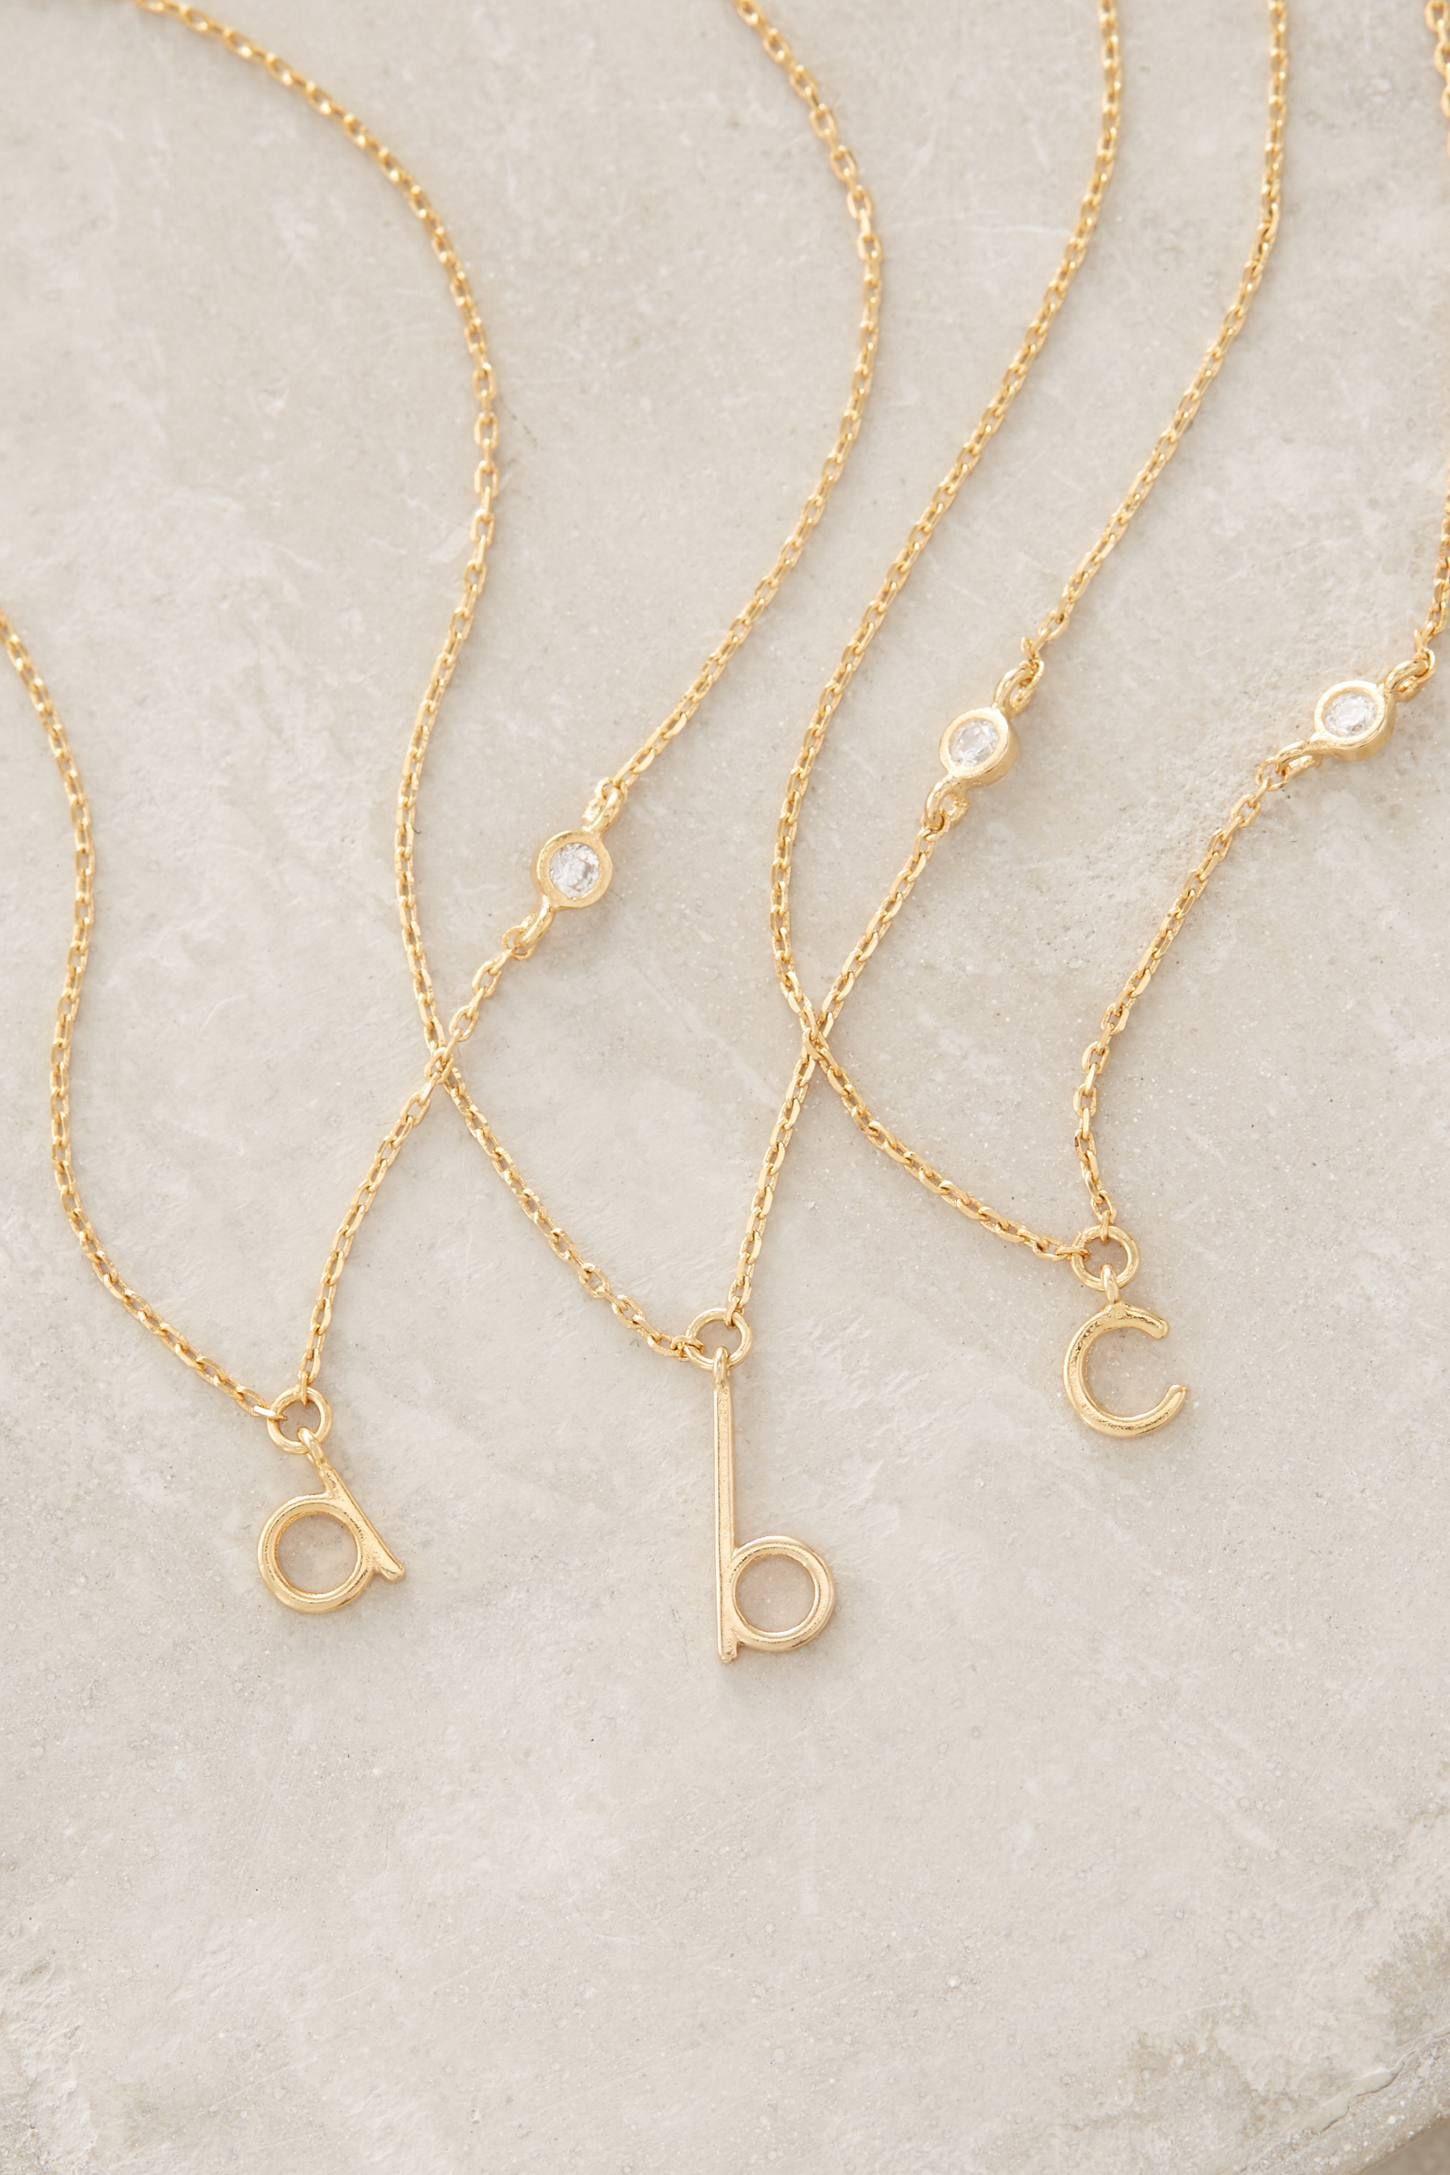 Mini monogram pendant necklace your anthropologie favorites mini monogram pendant necklace mozeypictures Image collections